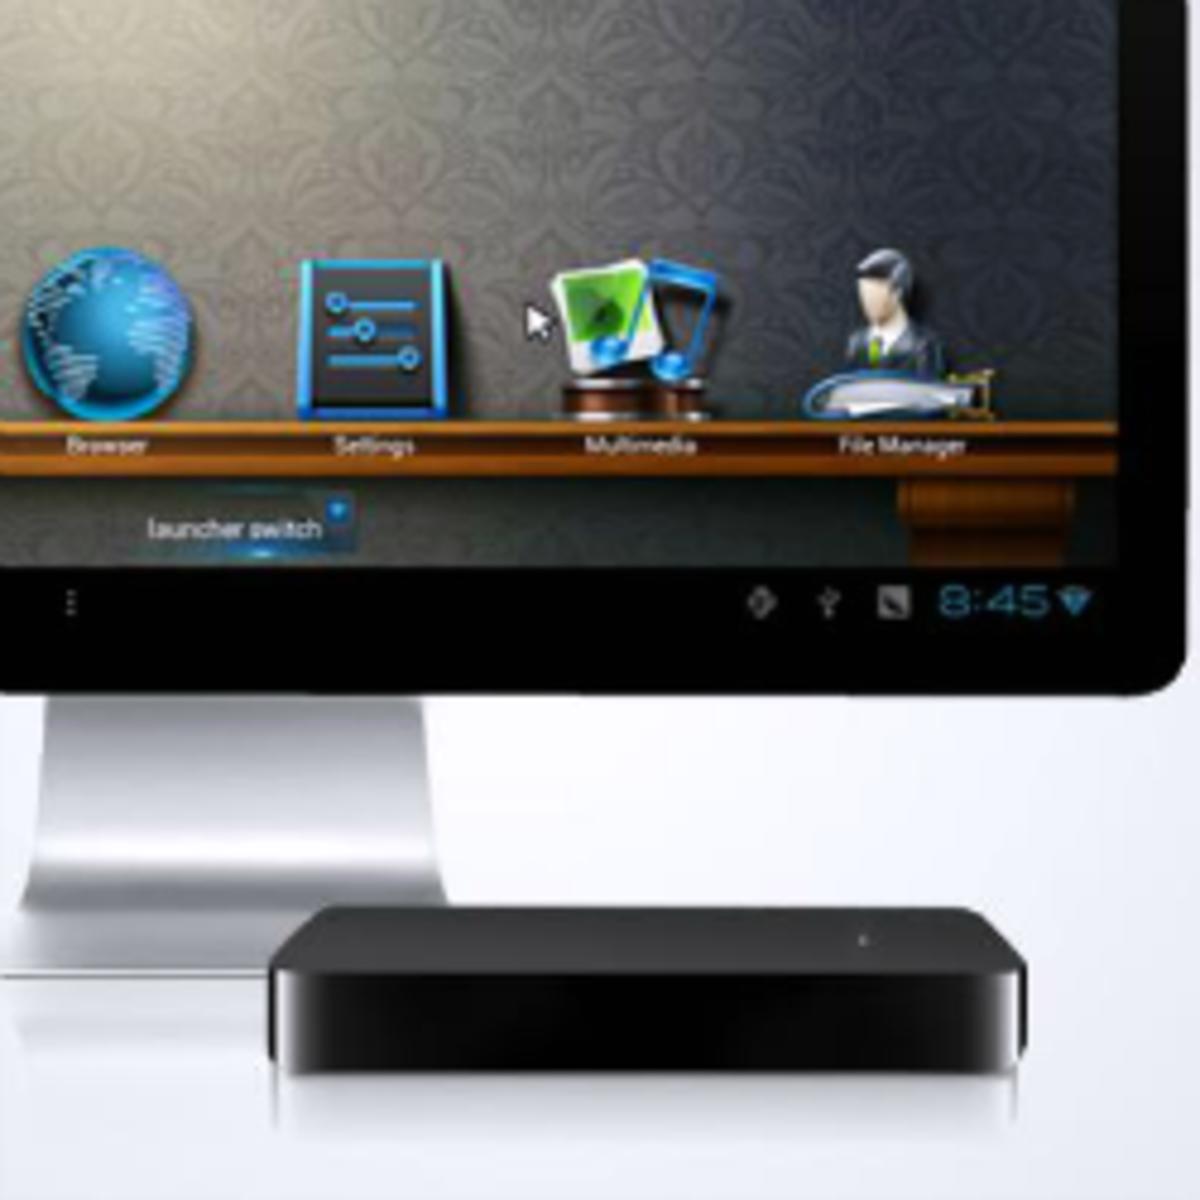 Uhost2 (Probox2) Android Mini PC Review